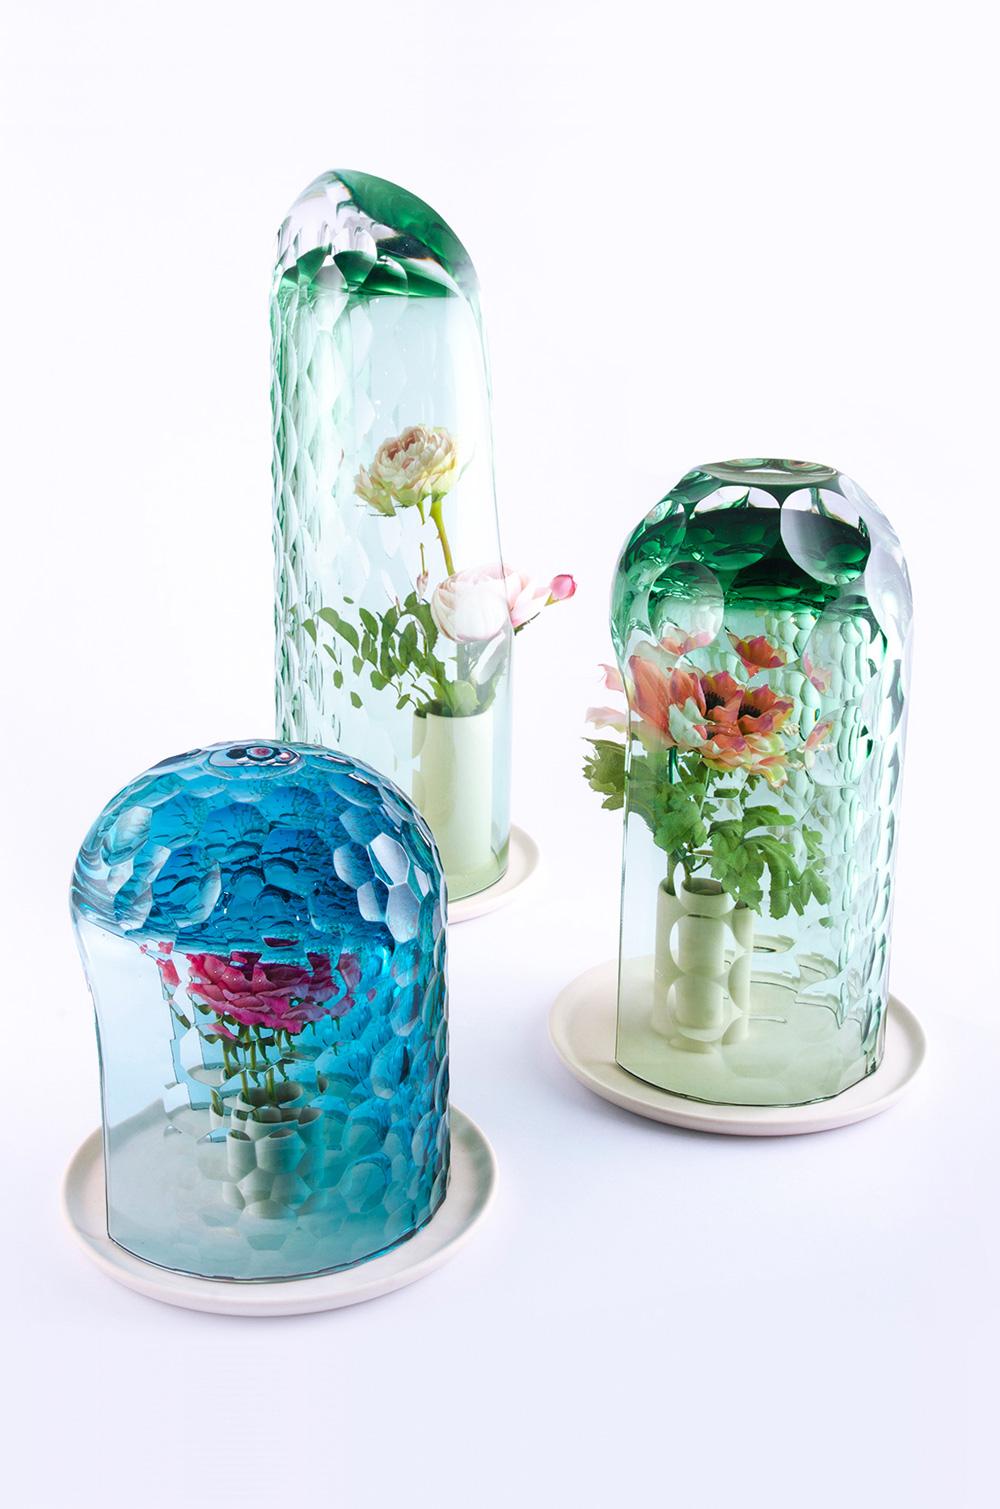 OP Vase Creates Bouquet Through Kaleidoscopic Optics